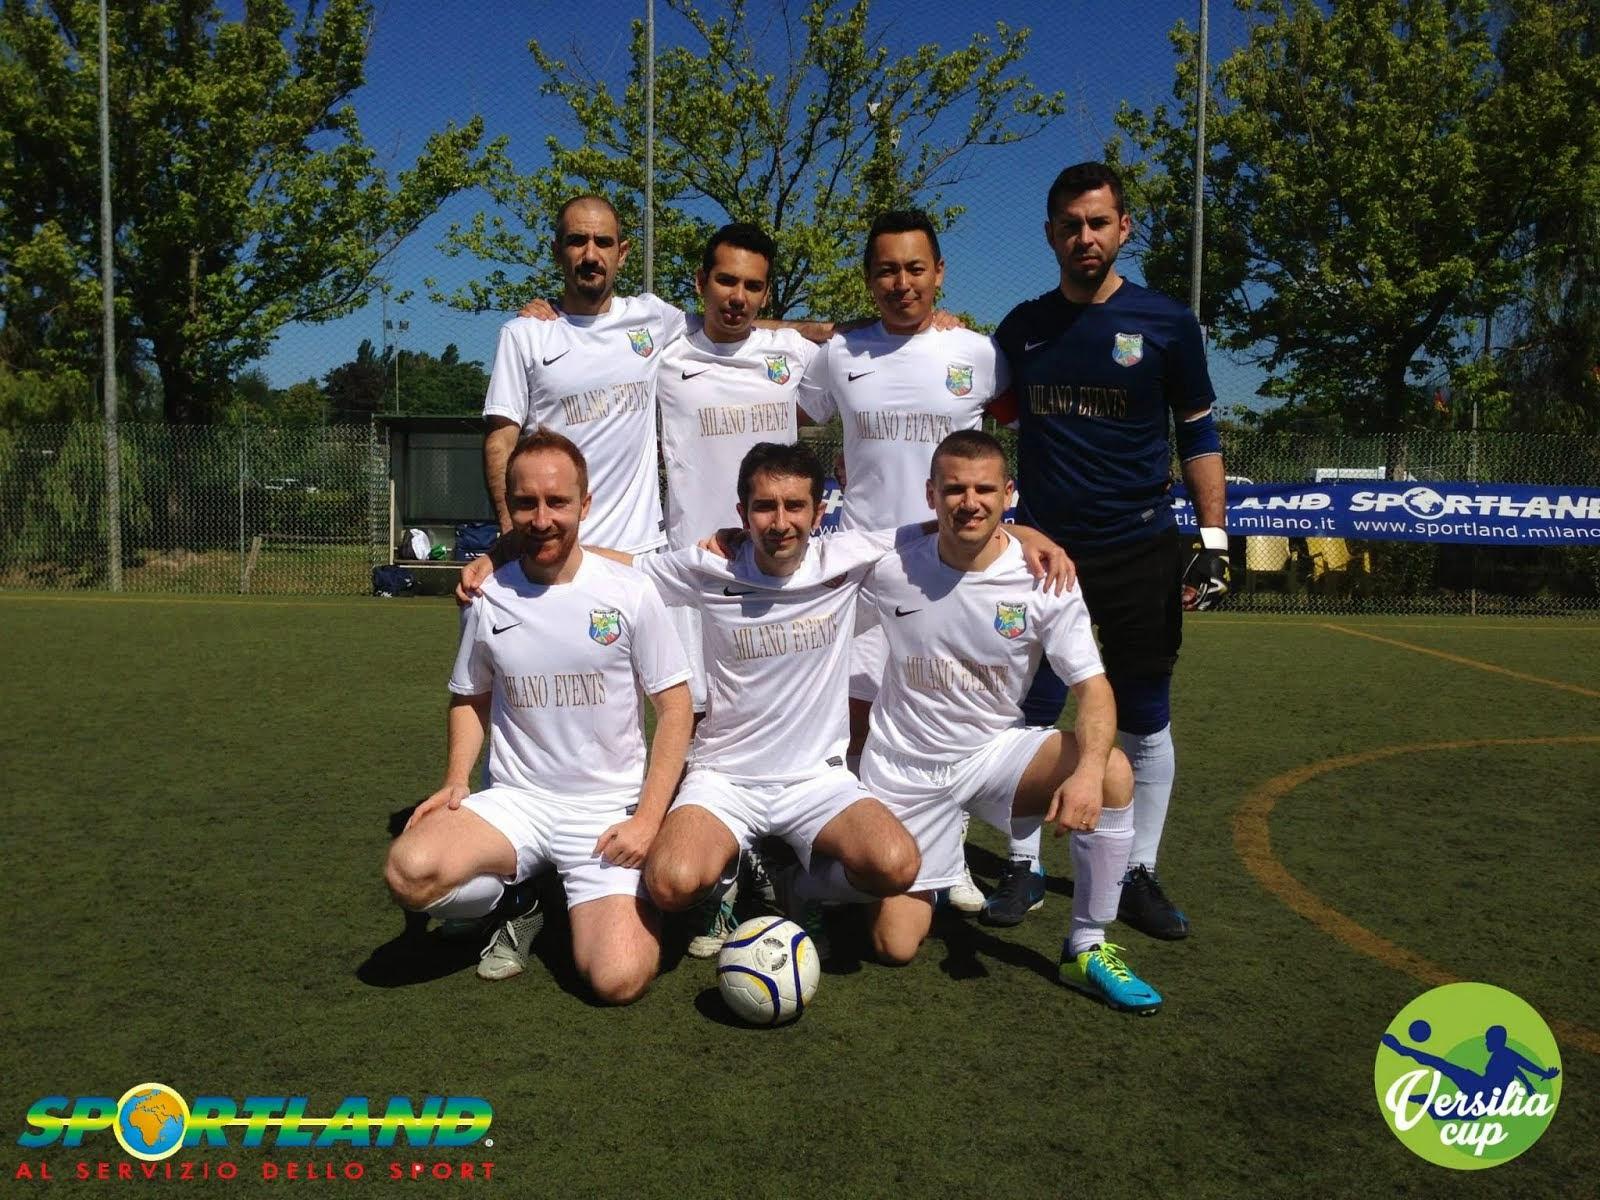 Versilia Cup